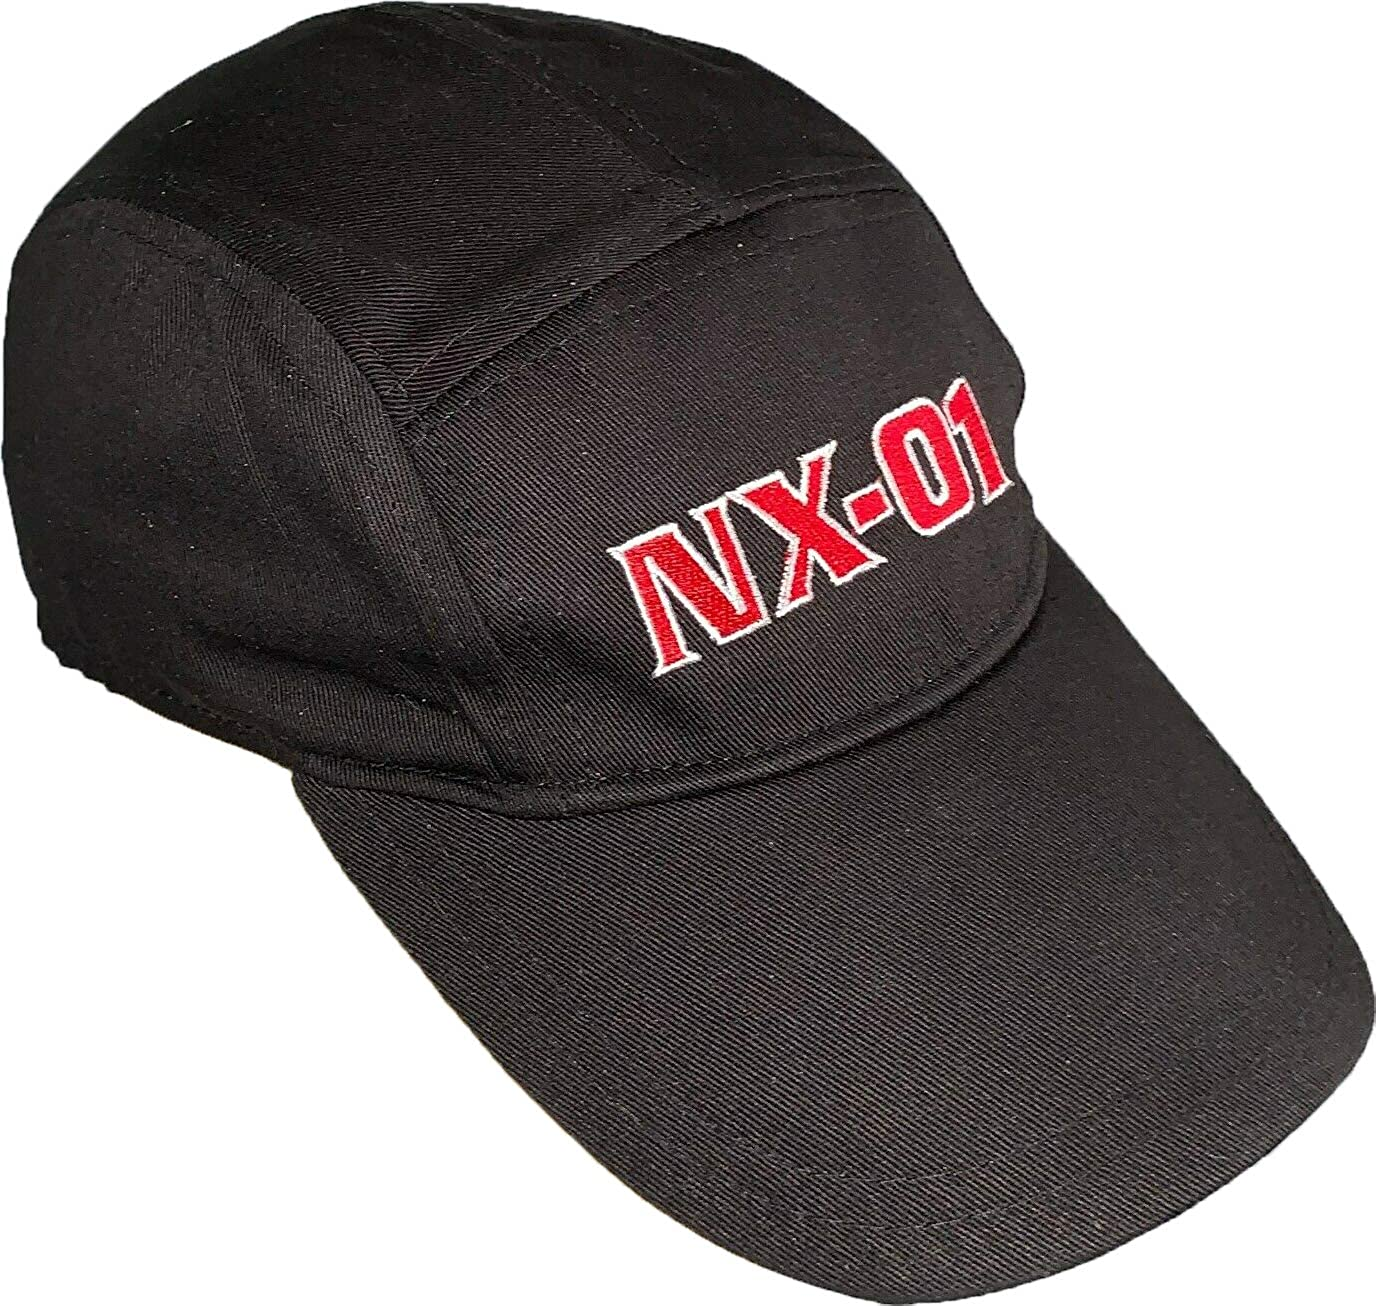 Star Trek III Movie Enterprise Patch Baseball Cap Hat NEW